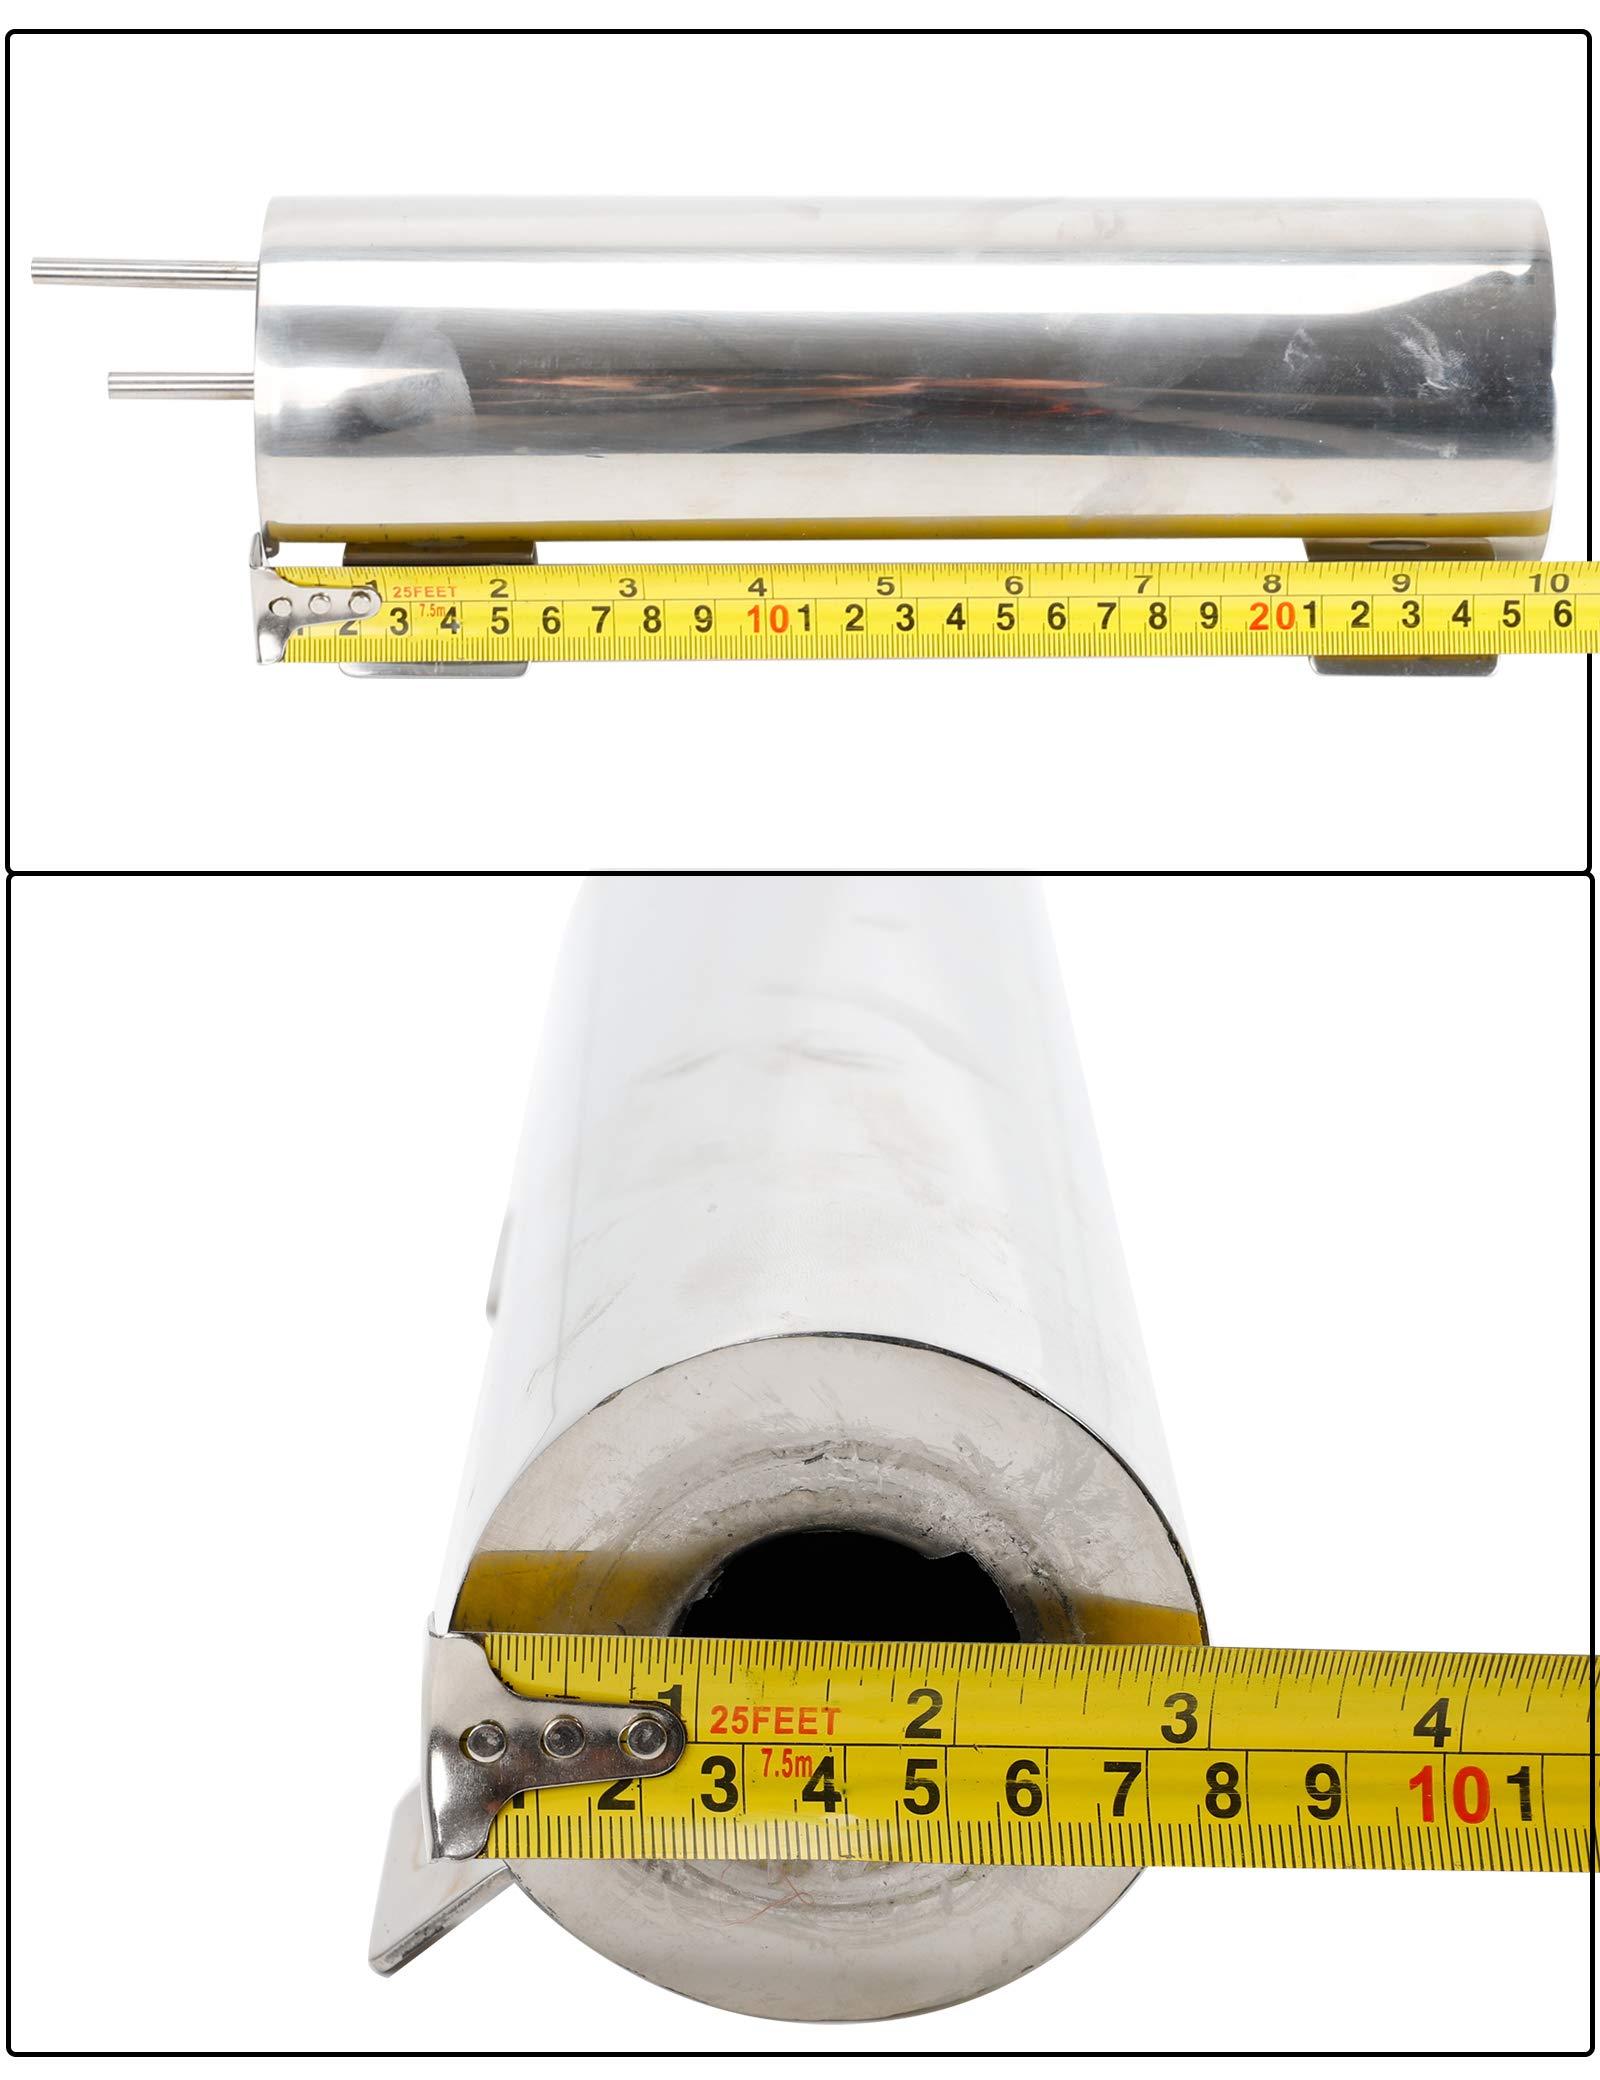 BLACKHORSE-RACING 3'' X 10'' Radiator Coolant Overflow Puke Tank Polished Stainless Steel 32OZ by BLACKHORSE-RACING (Image #4)